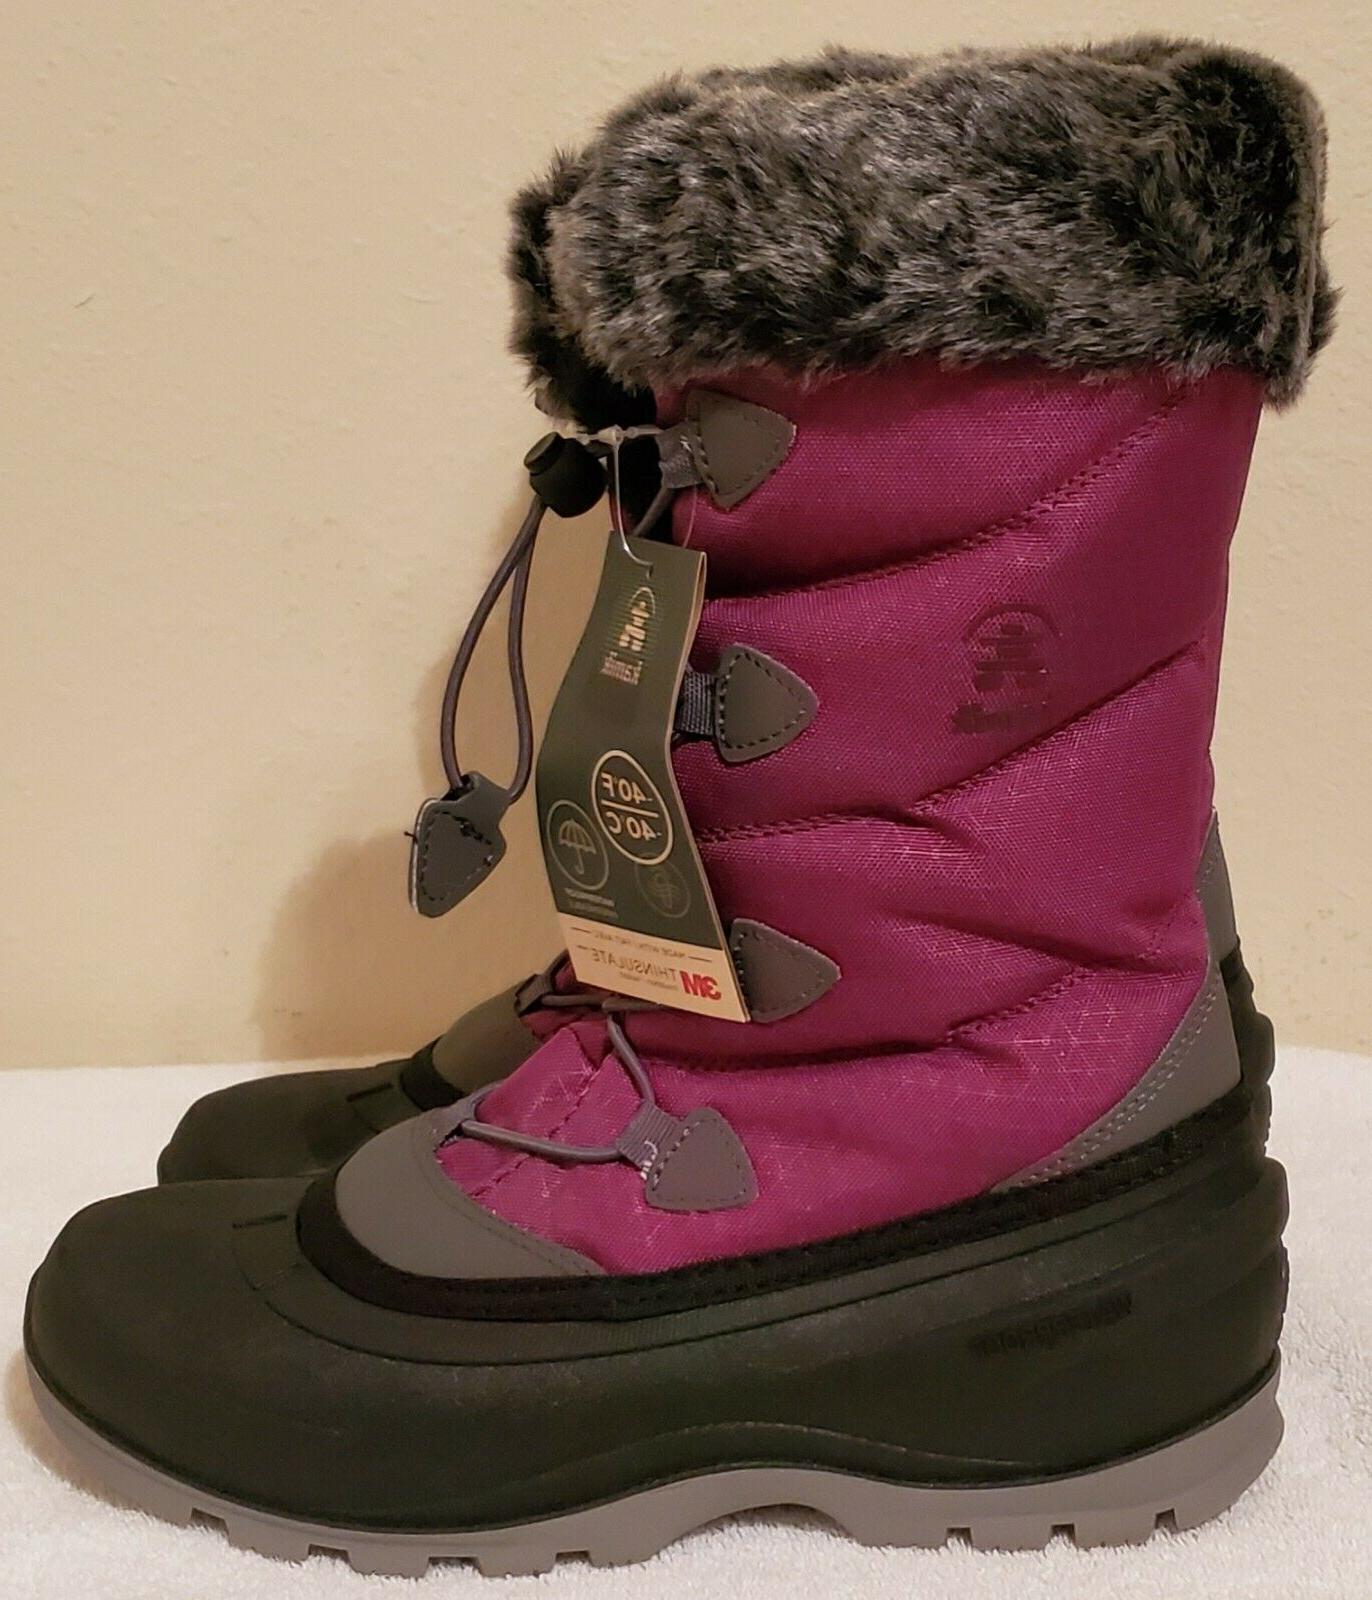 new momentum 2 boots sz 9